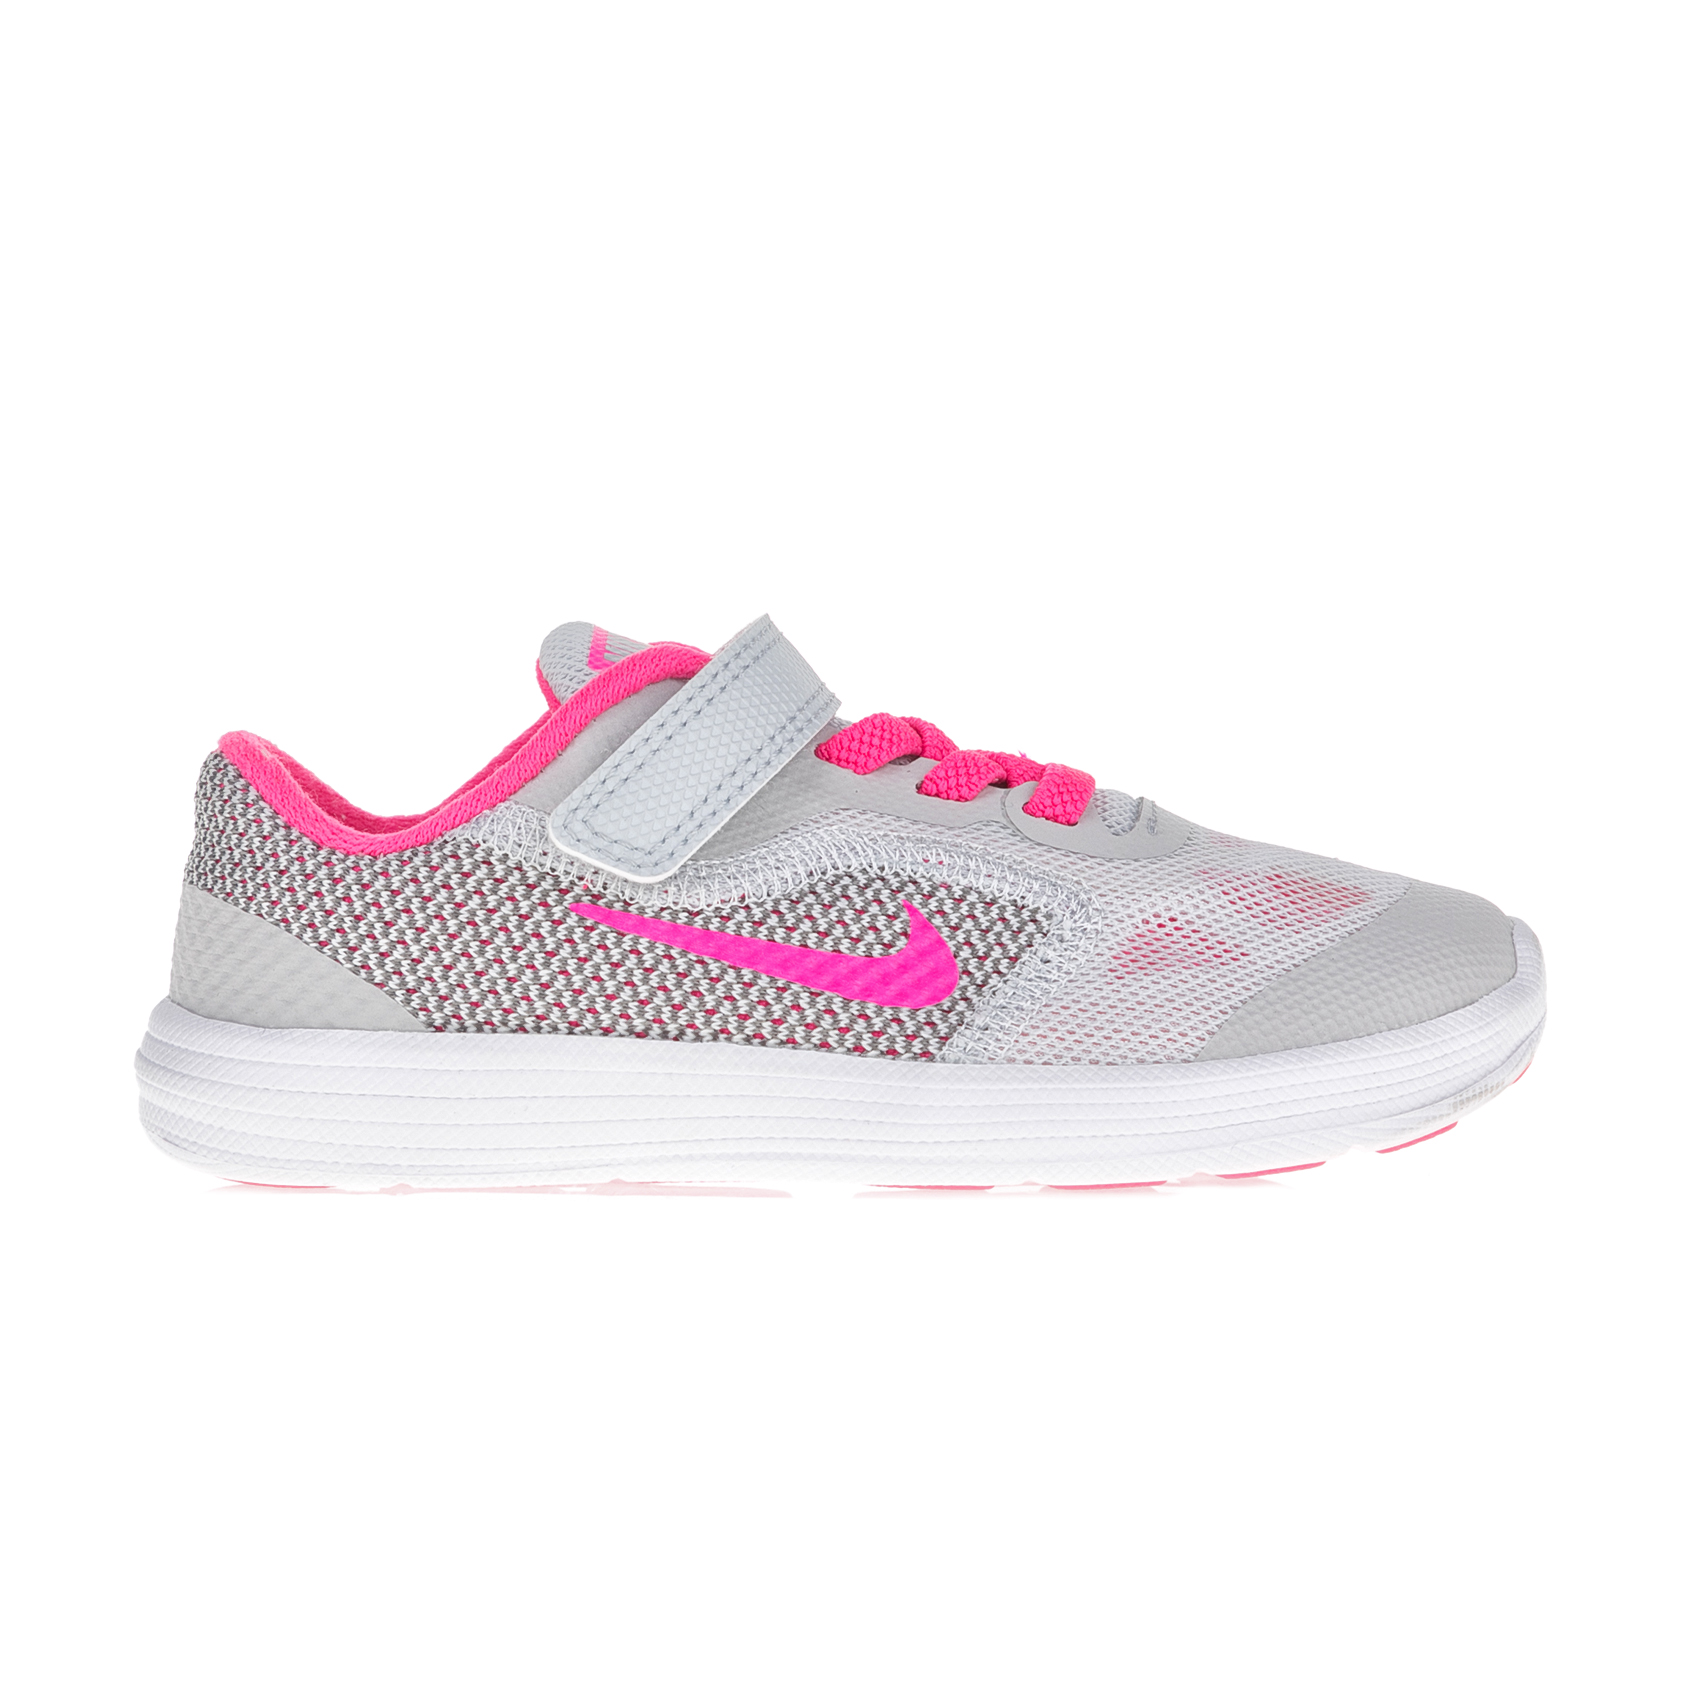 fb219b64818 NIKE – Βρεφικά αθλητικά παπούτσια Nike REVOLUTION 3 (TDV) λευκά – ροζ  Παιδικά/